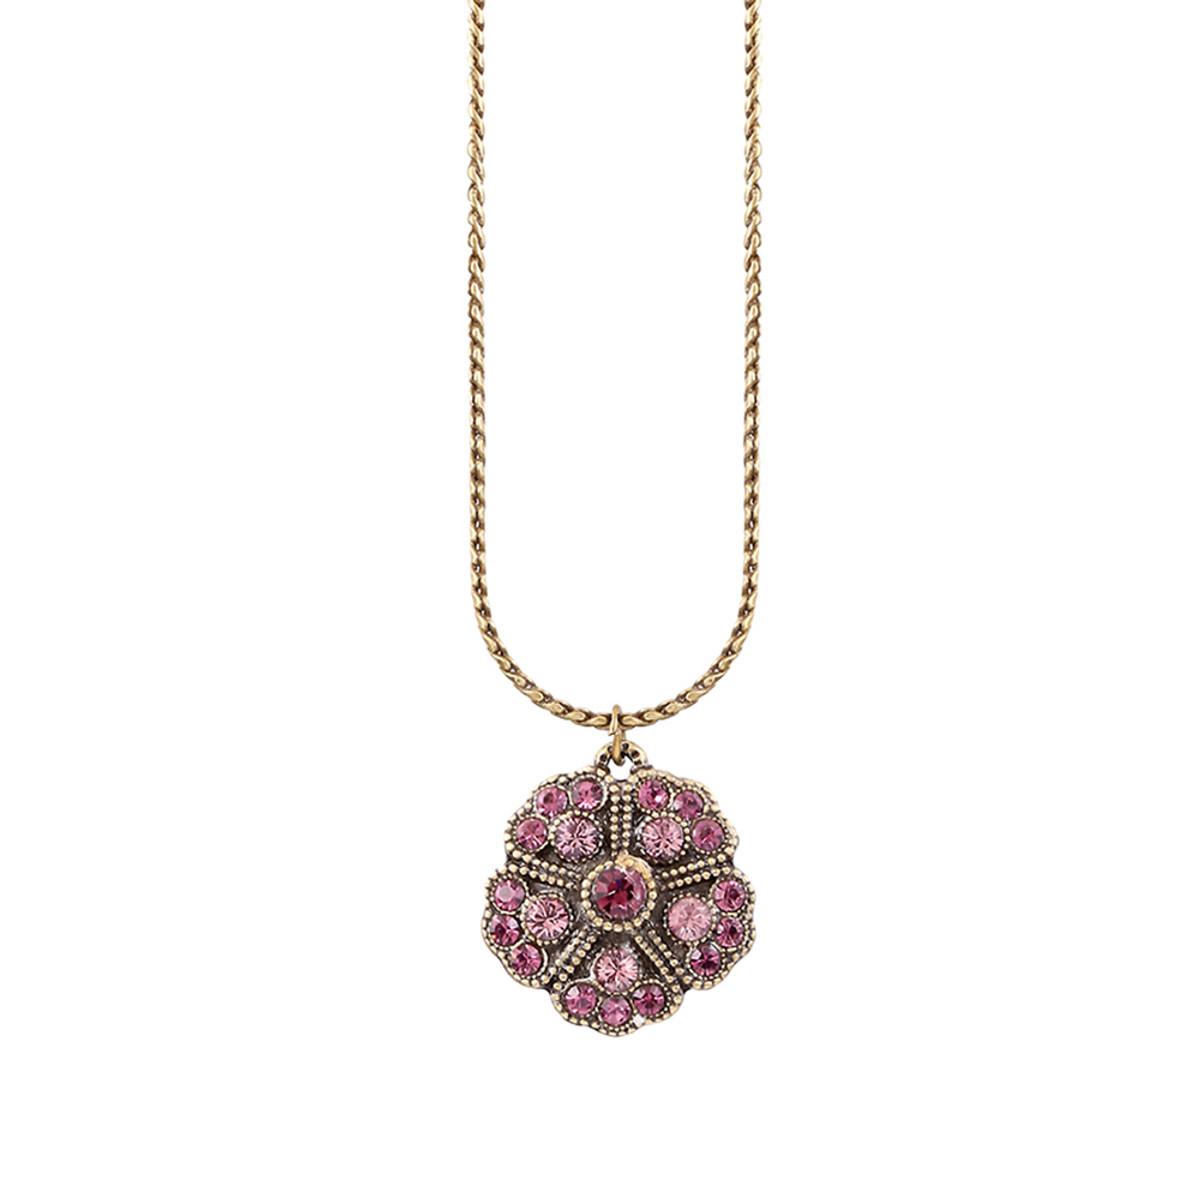 Michal Negrin Jade Sparkle Necklace